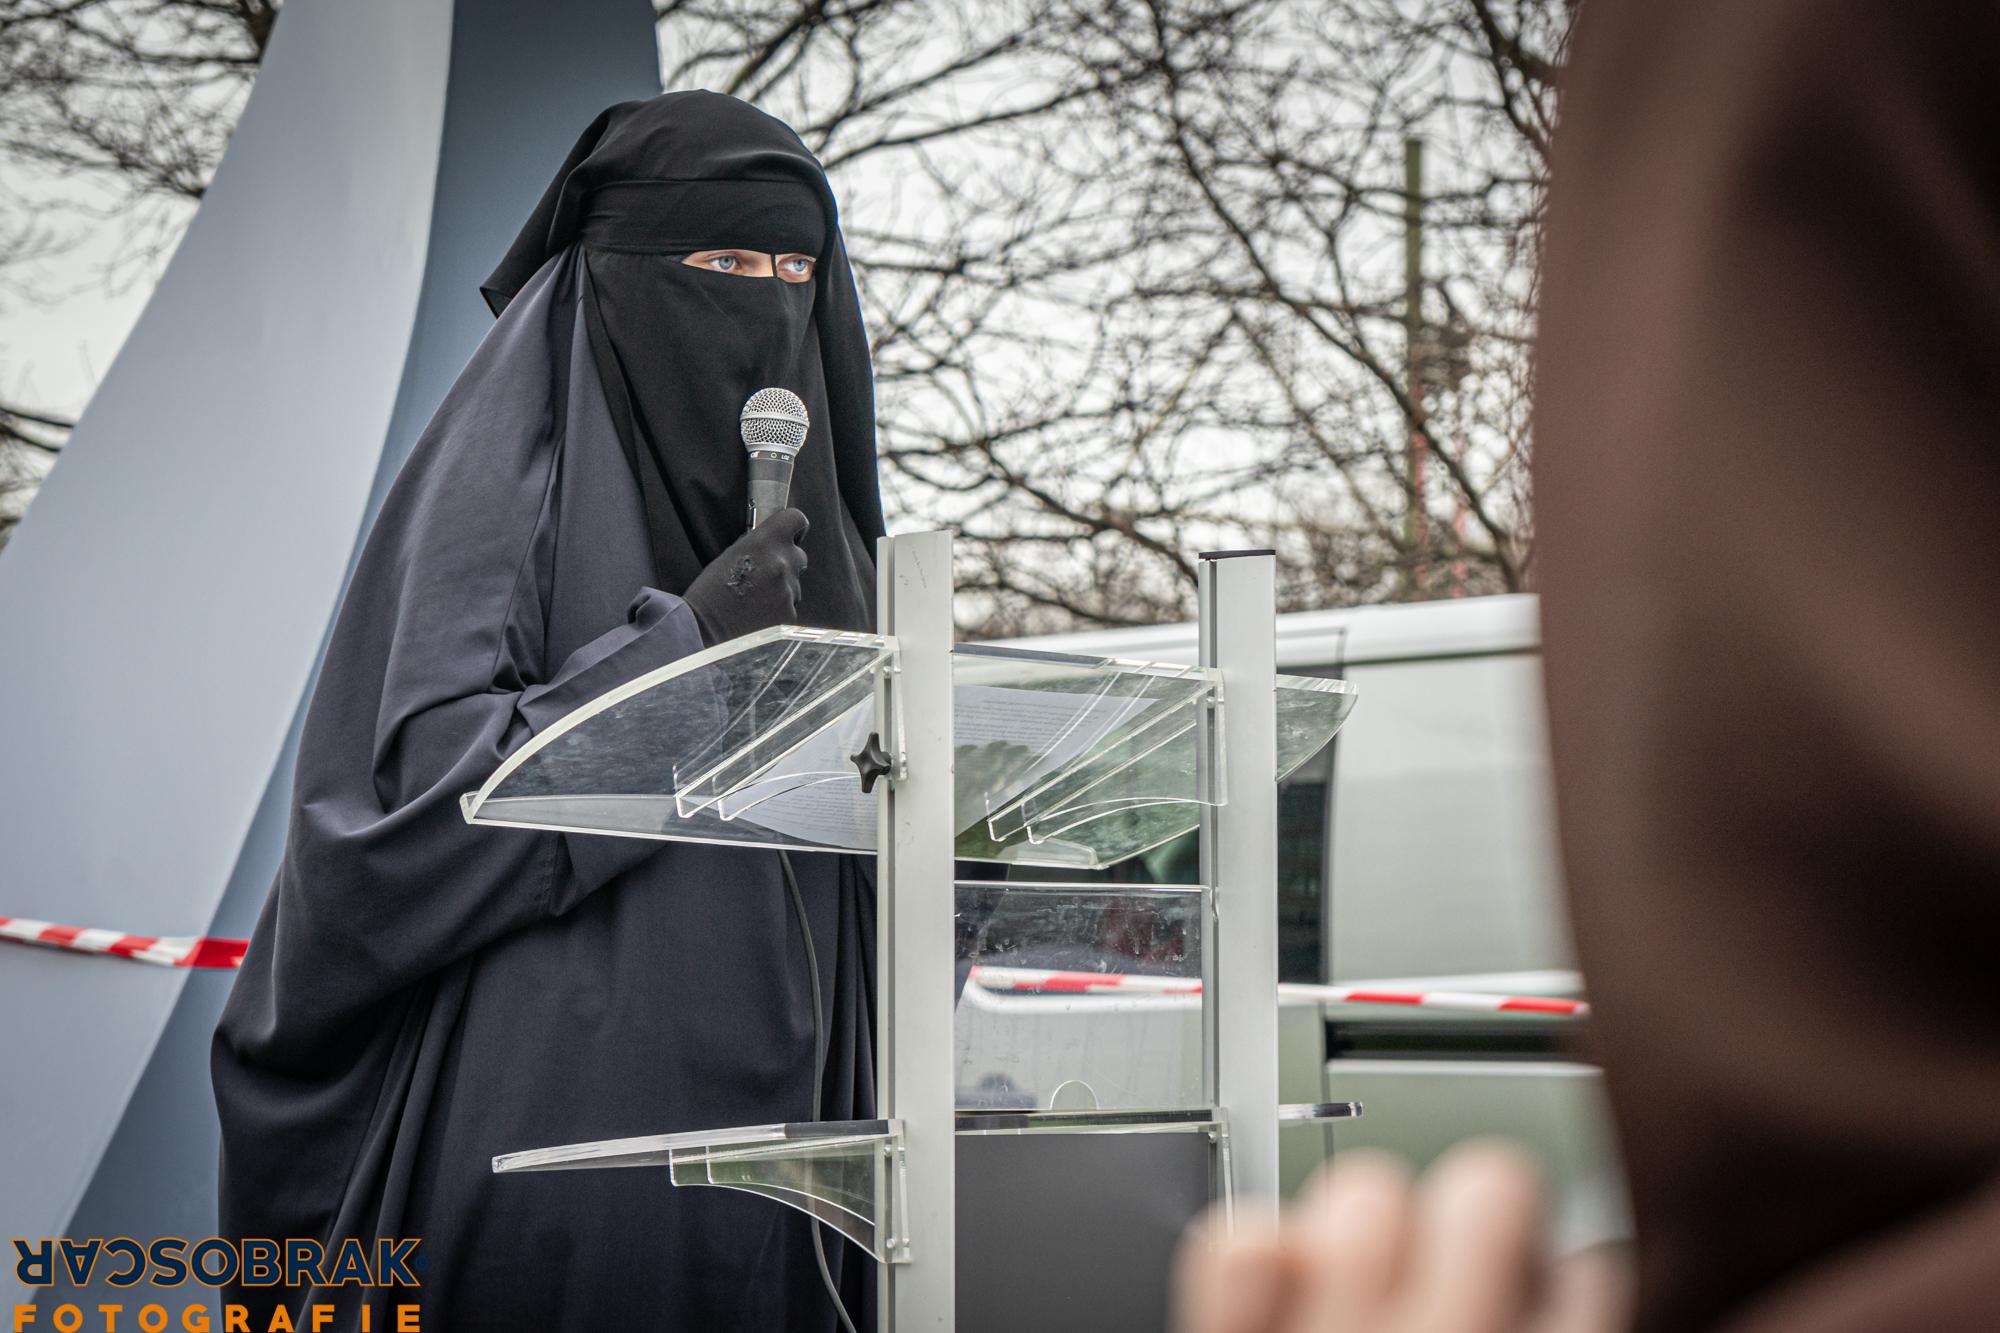 niqab verbod den haag oscar brak fotografie